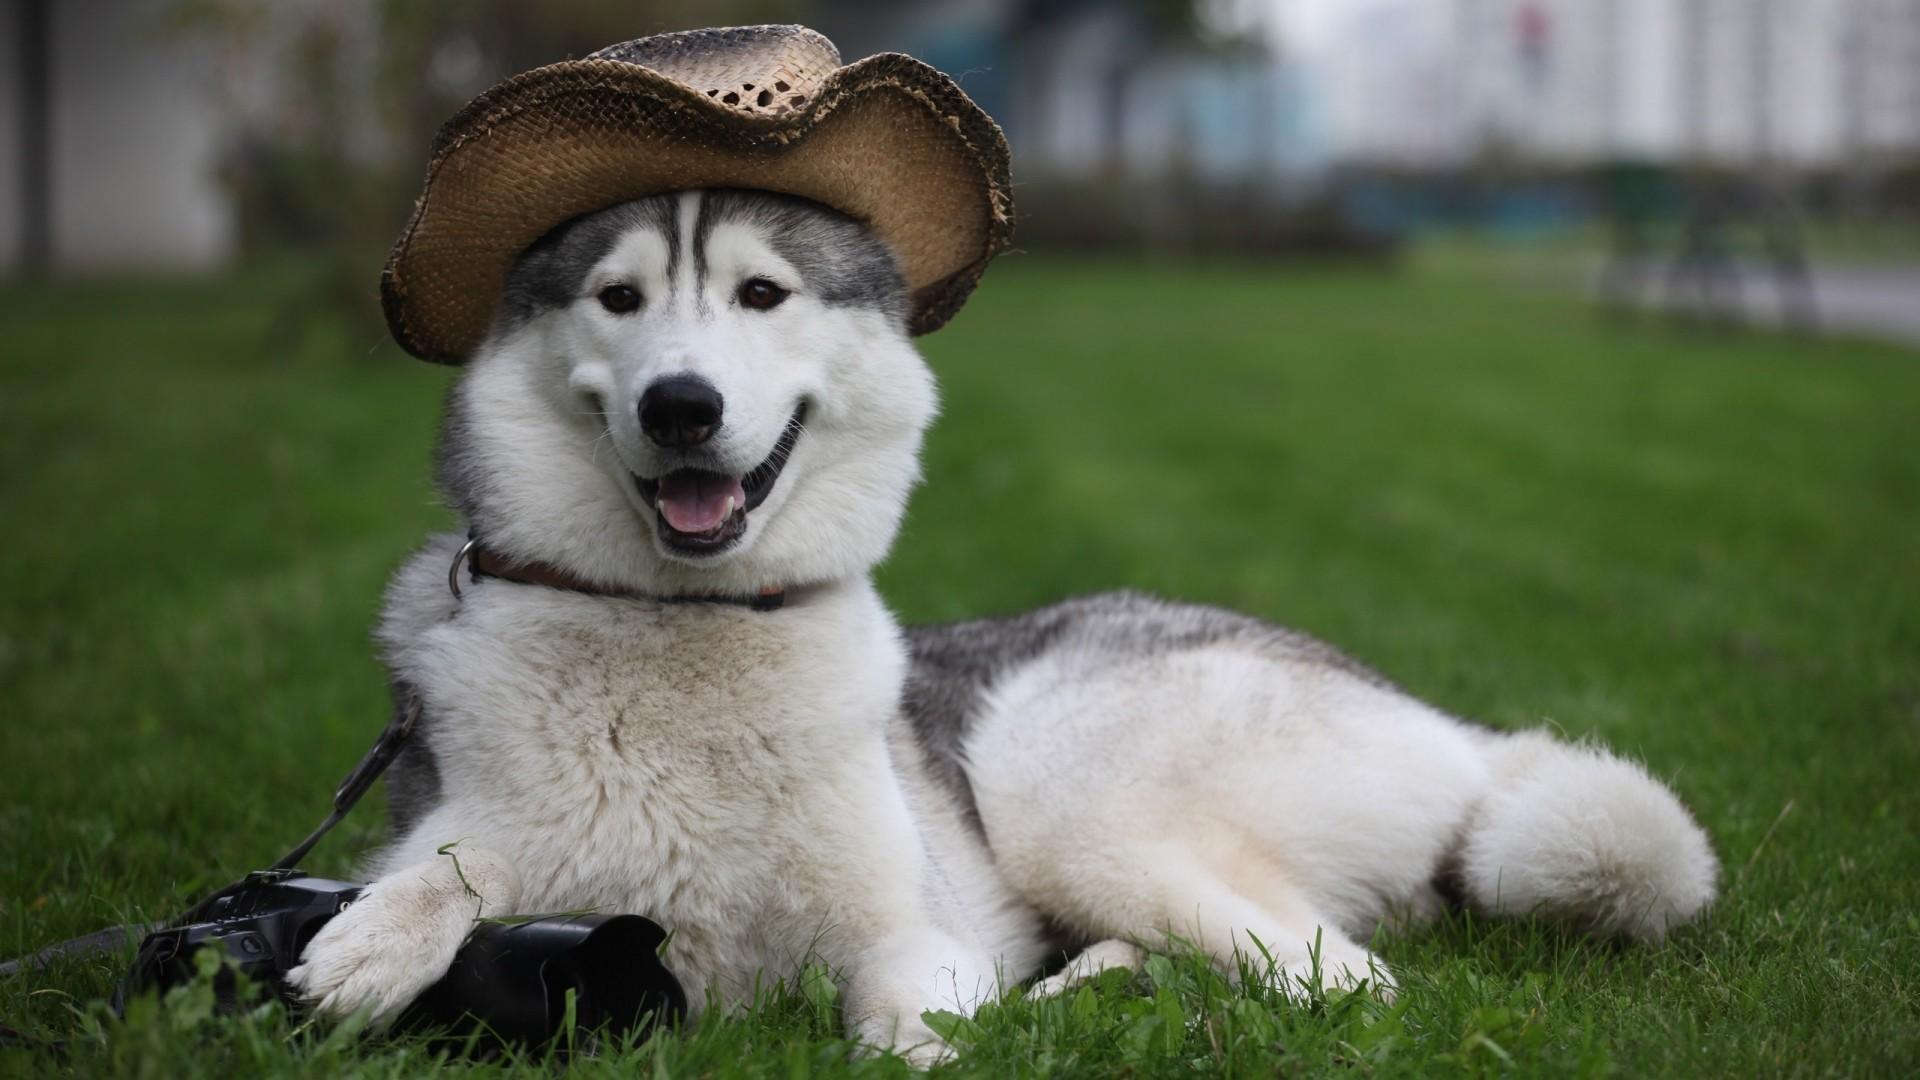 Wallpaper dog, furry, hat, white, lie